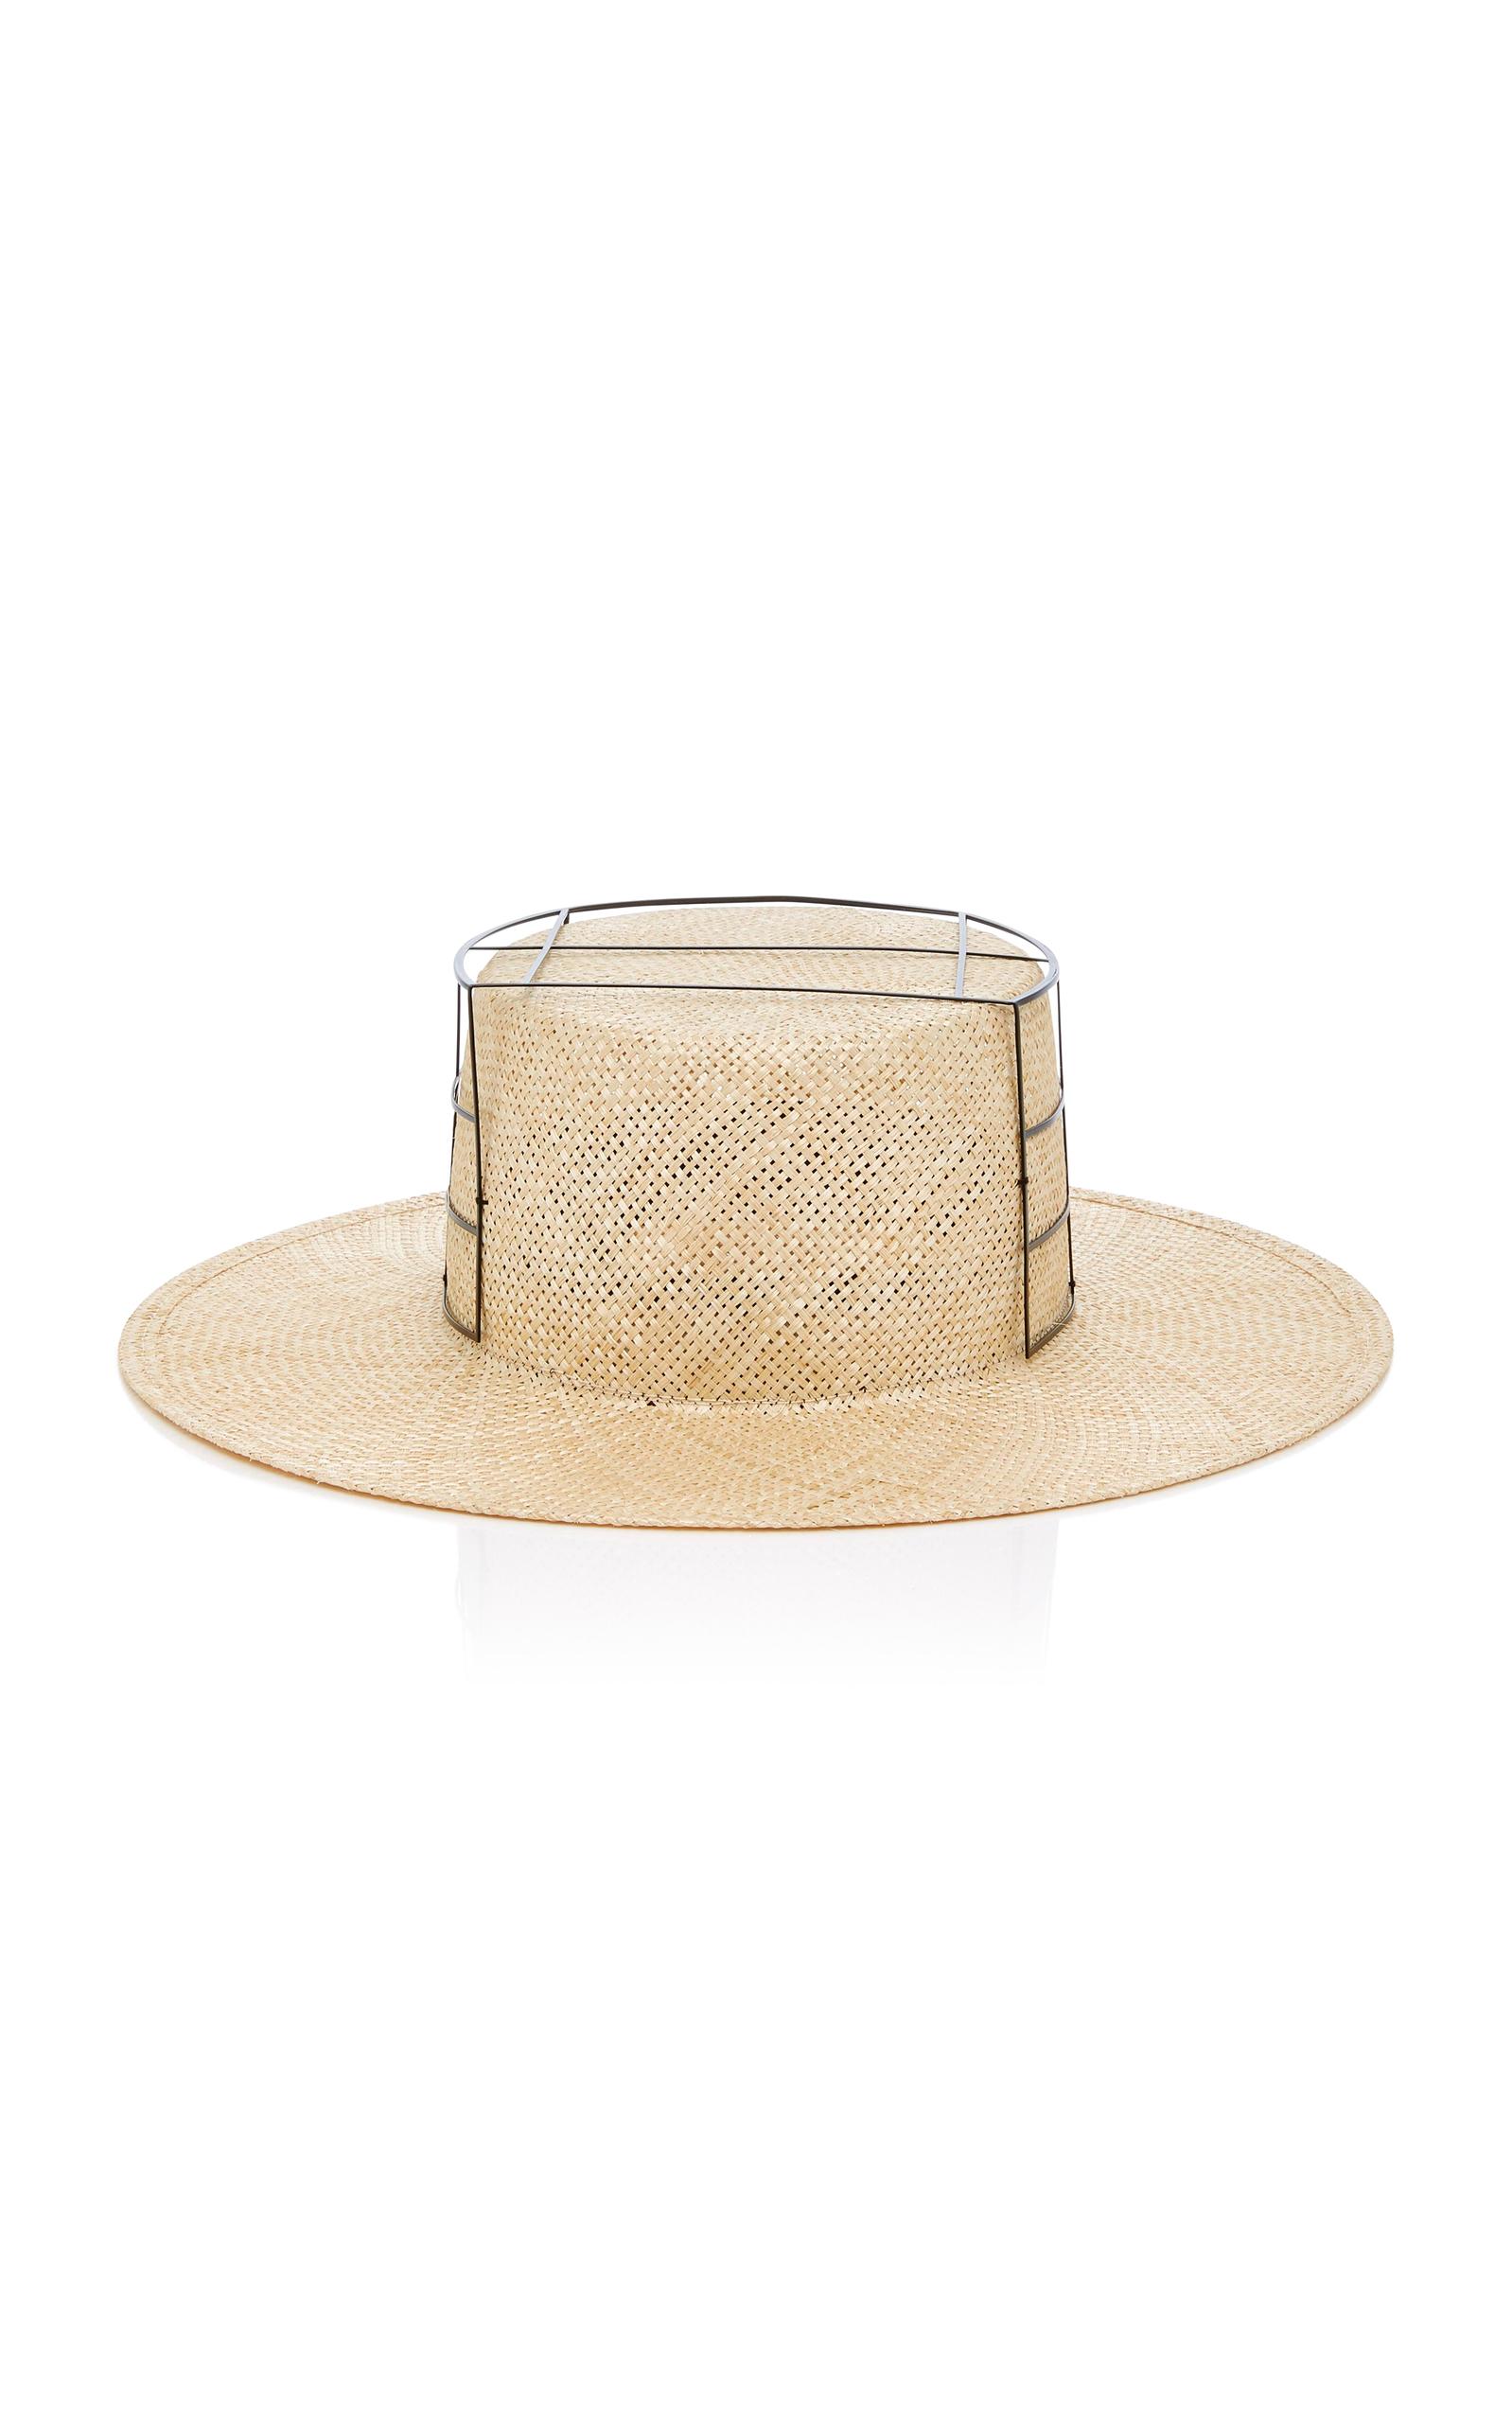 3013d2c22e7 Greg Bourdy Womens Boater Hat Amazon